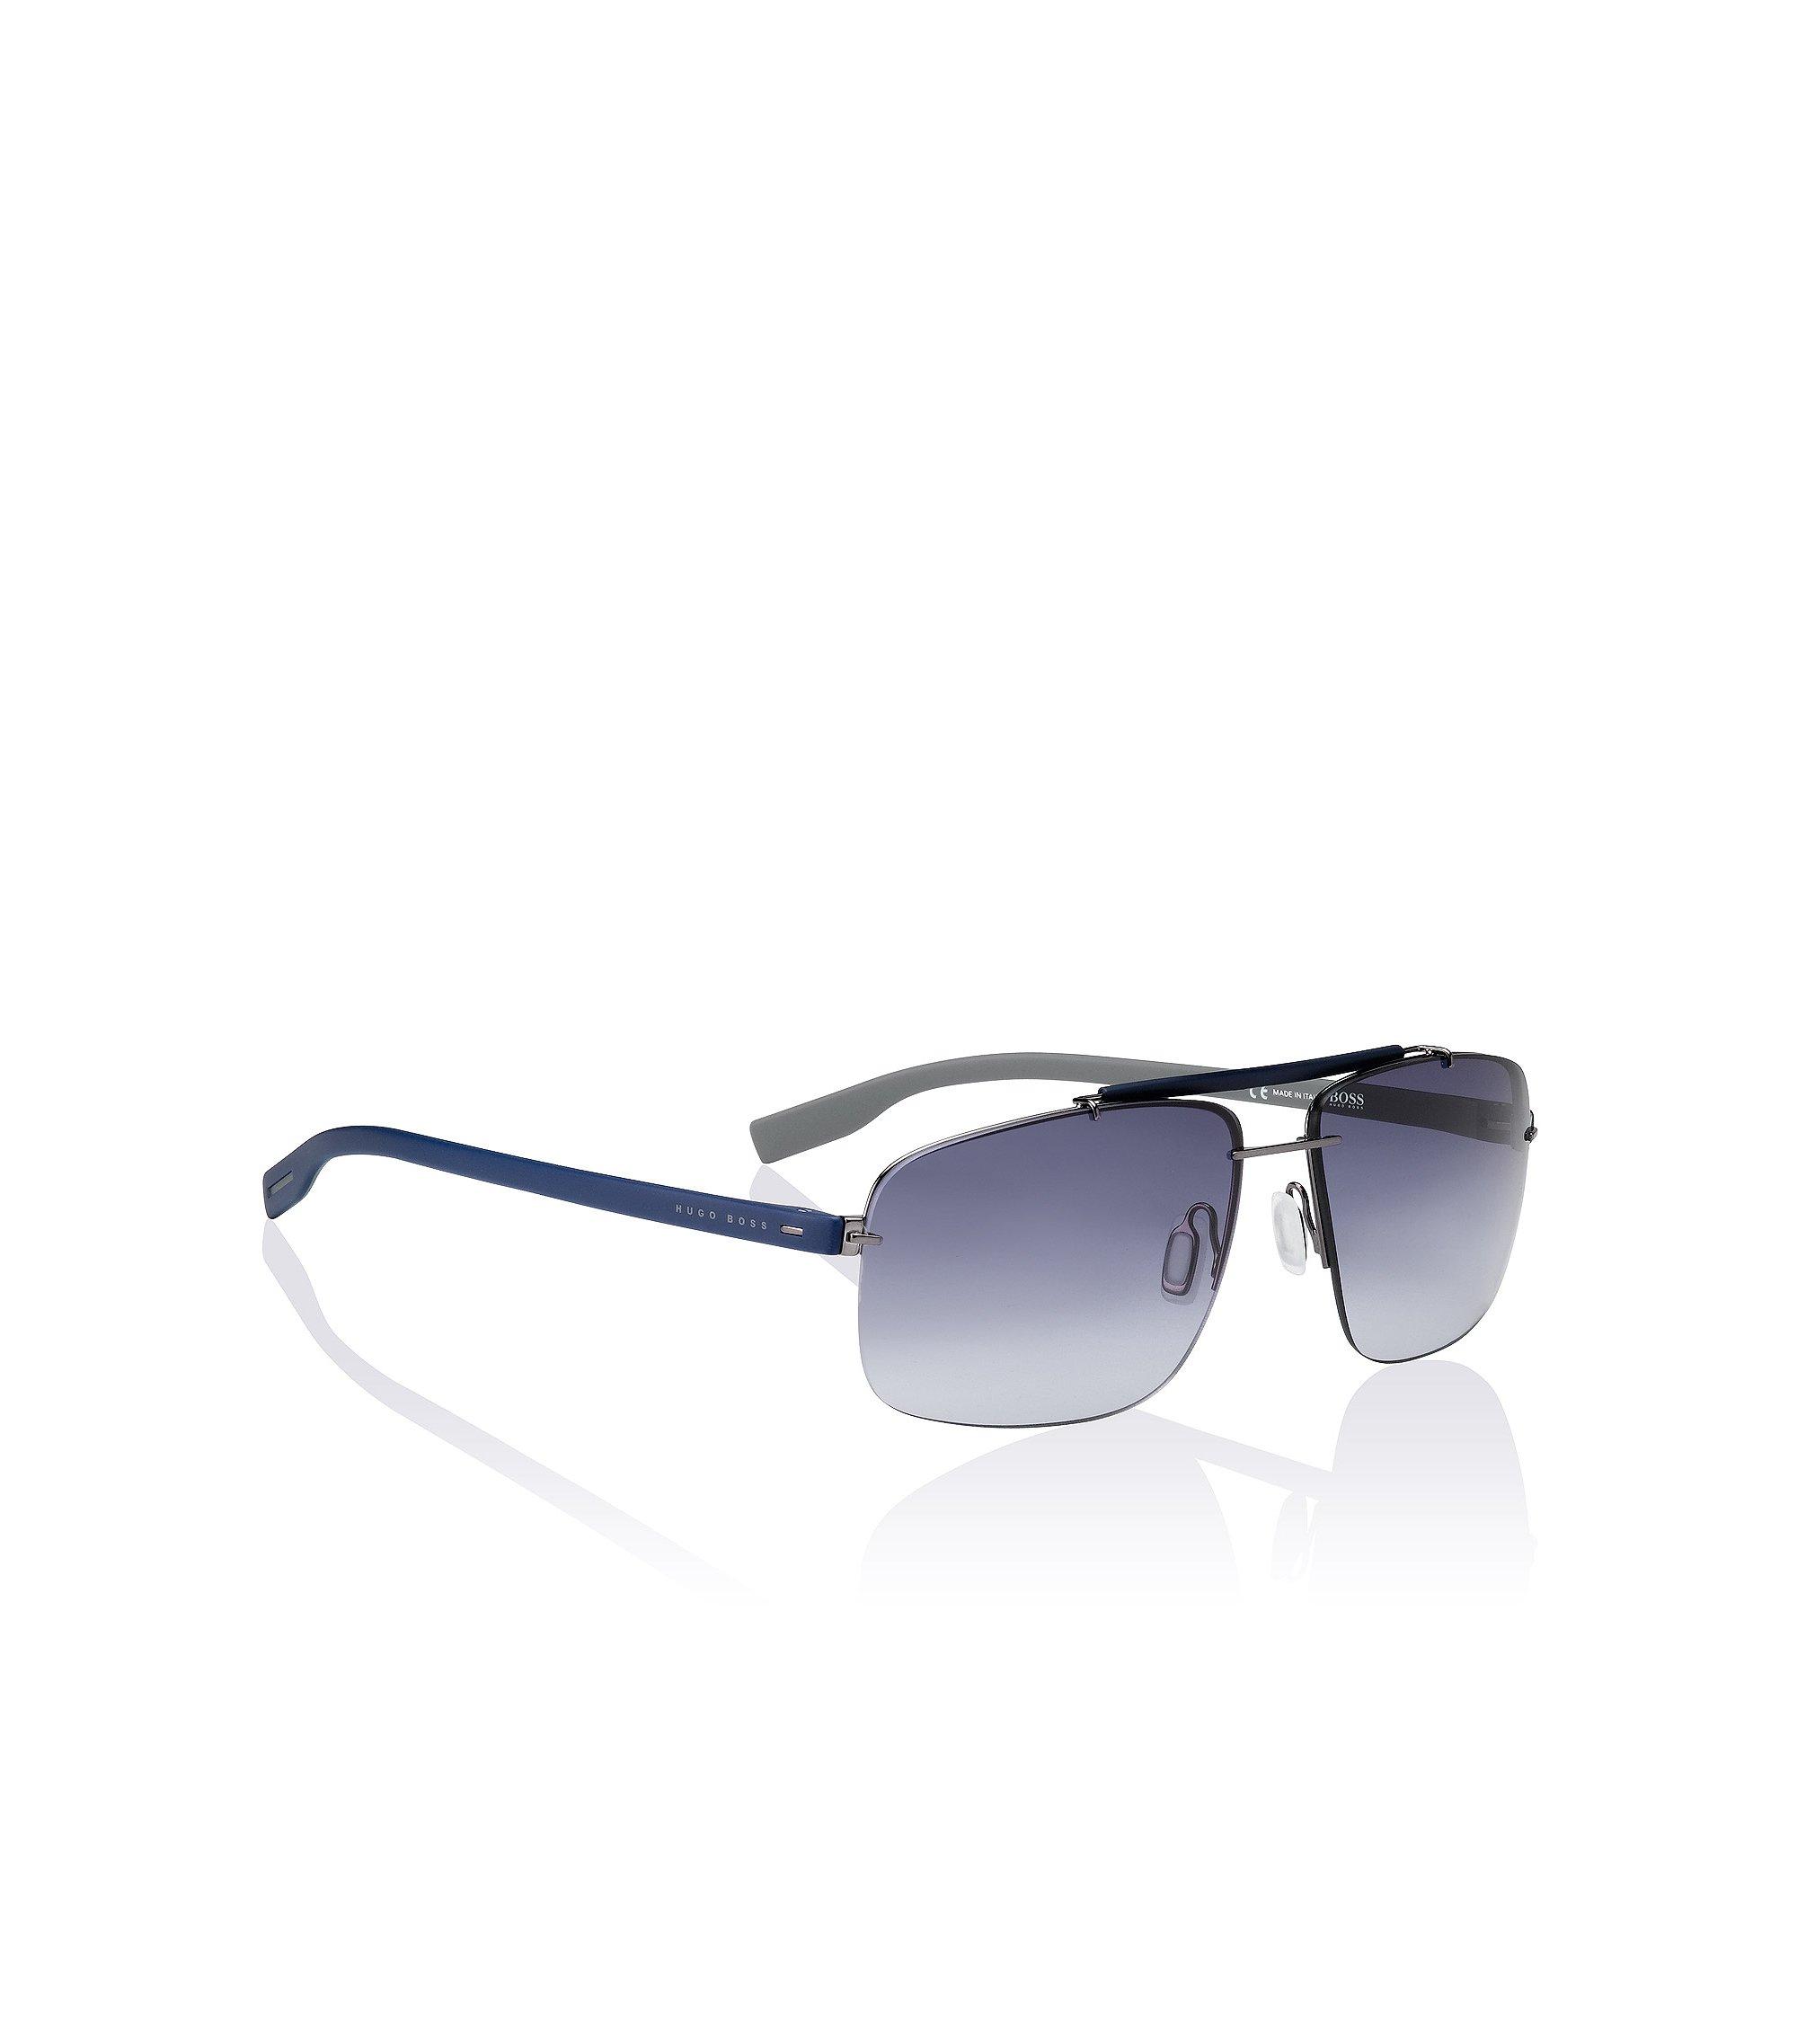 Sonnenbrille ´BOSS 0608`, Assorted-Pre-Pack